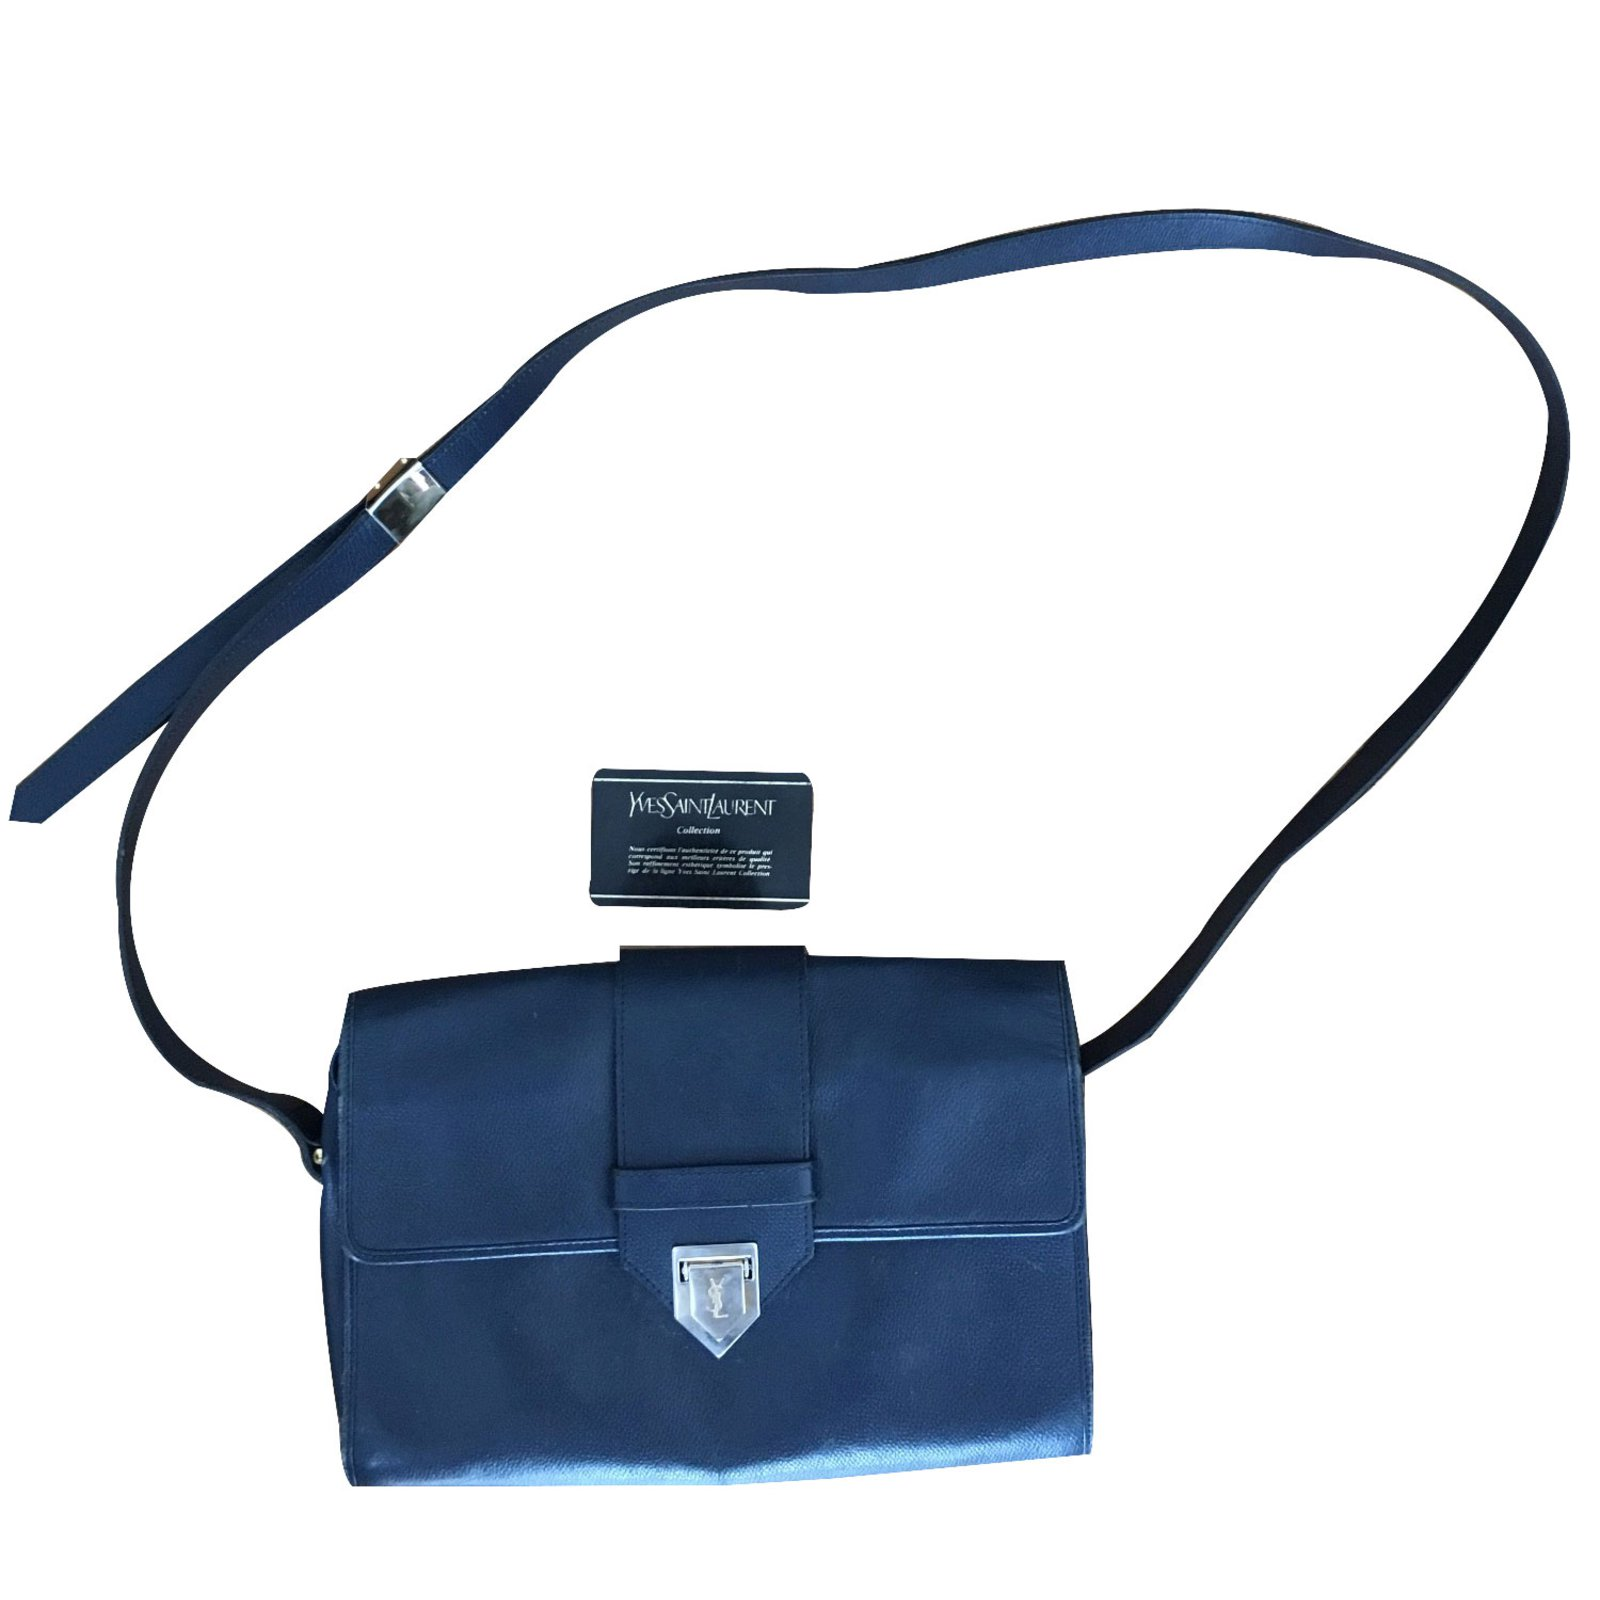 Yves Saint Laurent Handbag Handbags Leather Blue ref.24709 - Joli Closet 8f3ba44fe5